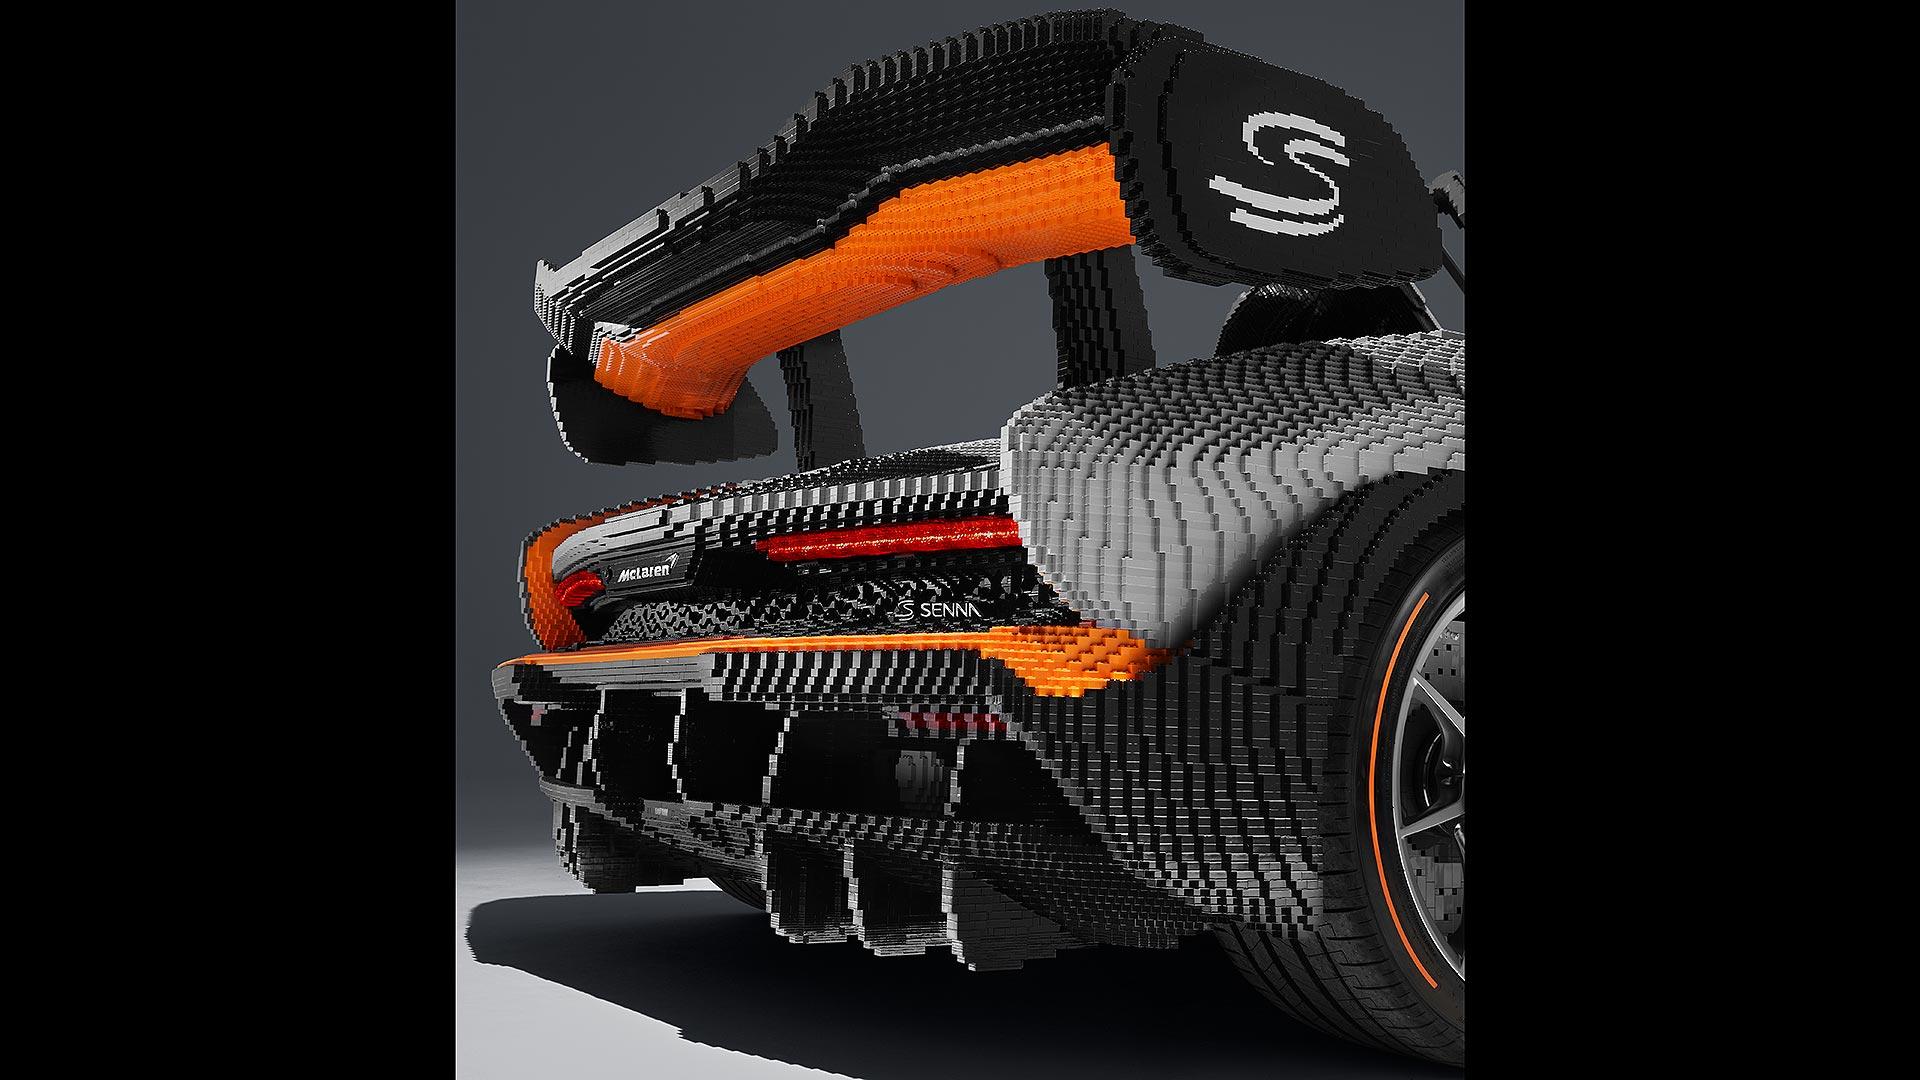 LEGO McLaren Senna rear spoiler